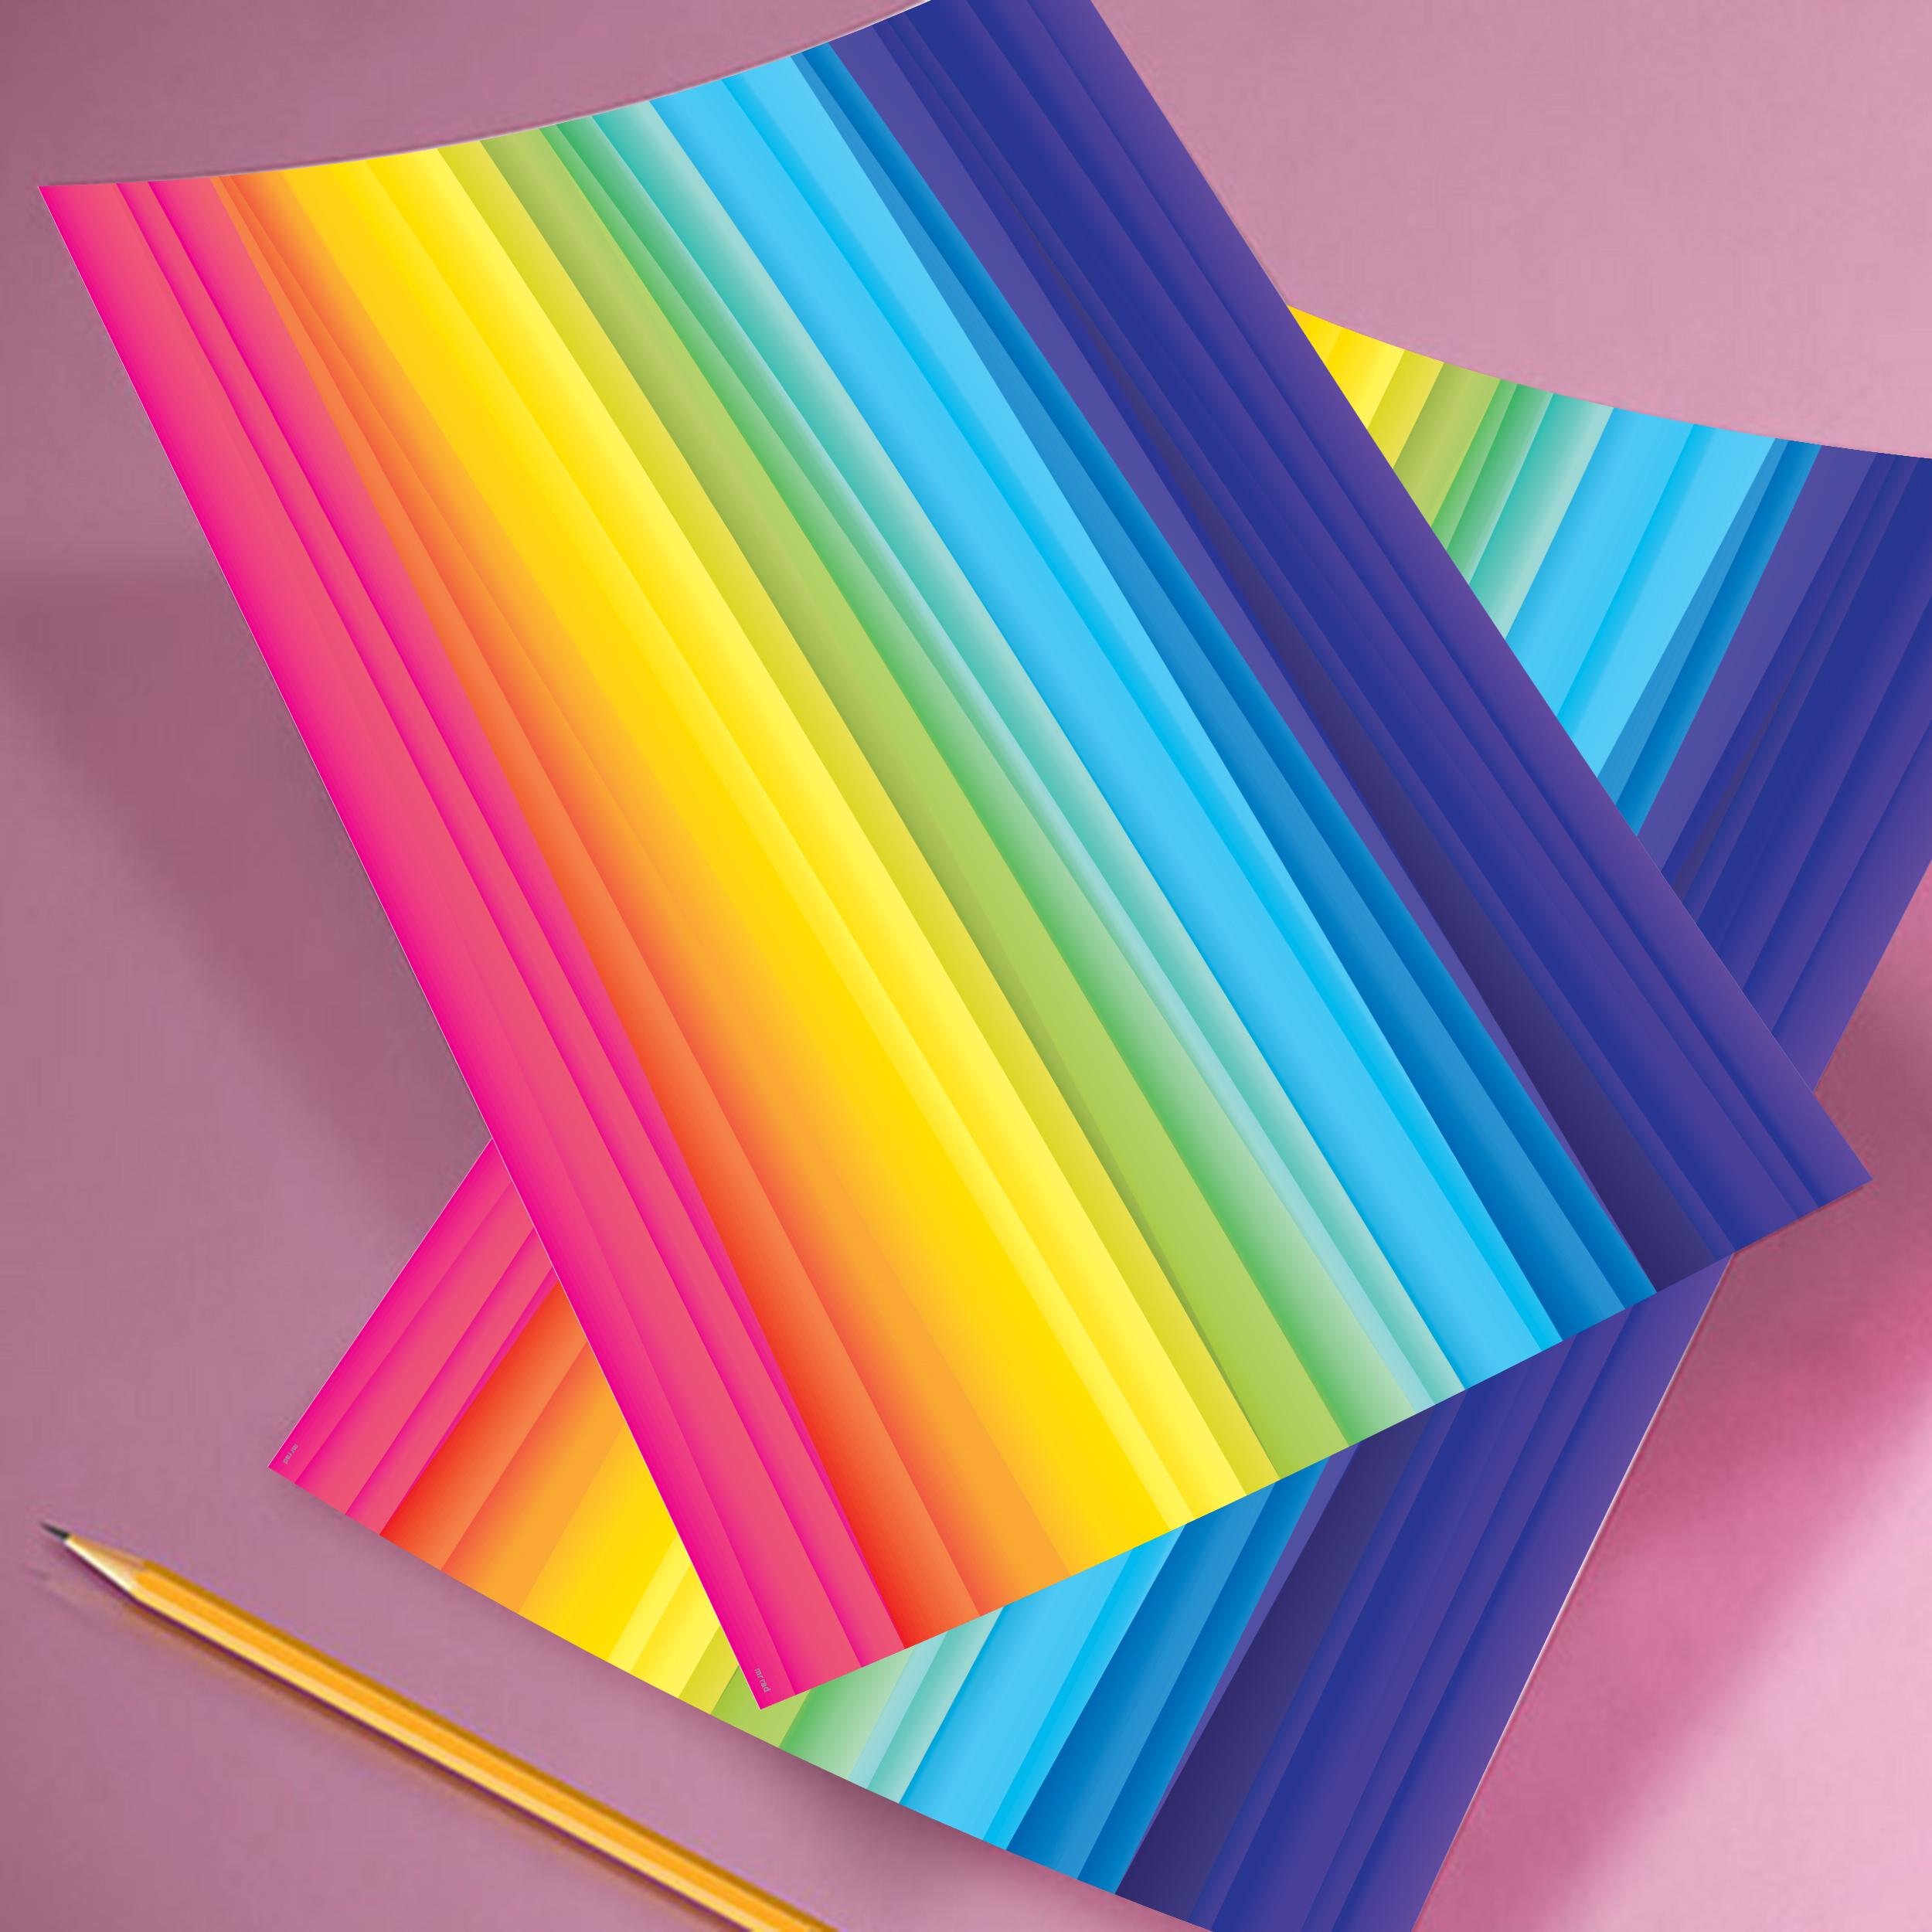 کاغذ رنگی A4 مستر راد مدل رنگارنگ بسته 10 عددی main 1 11